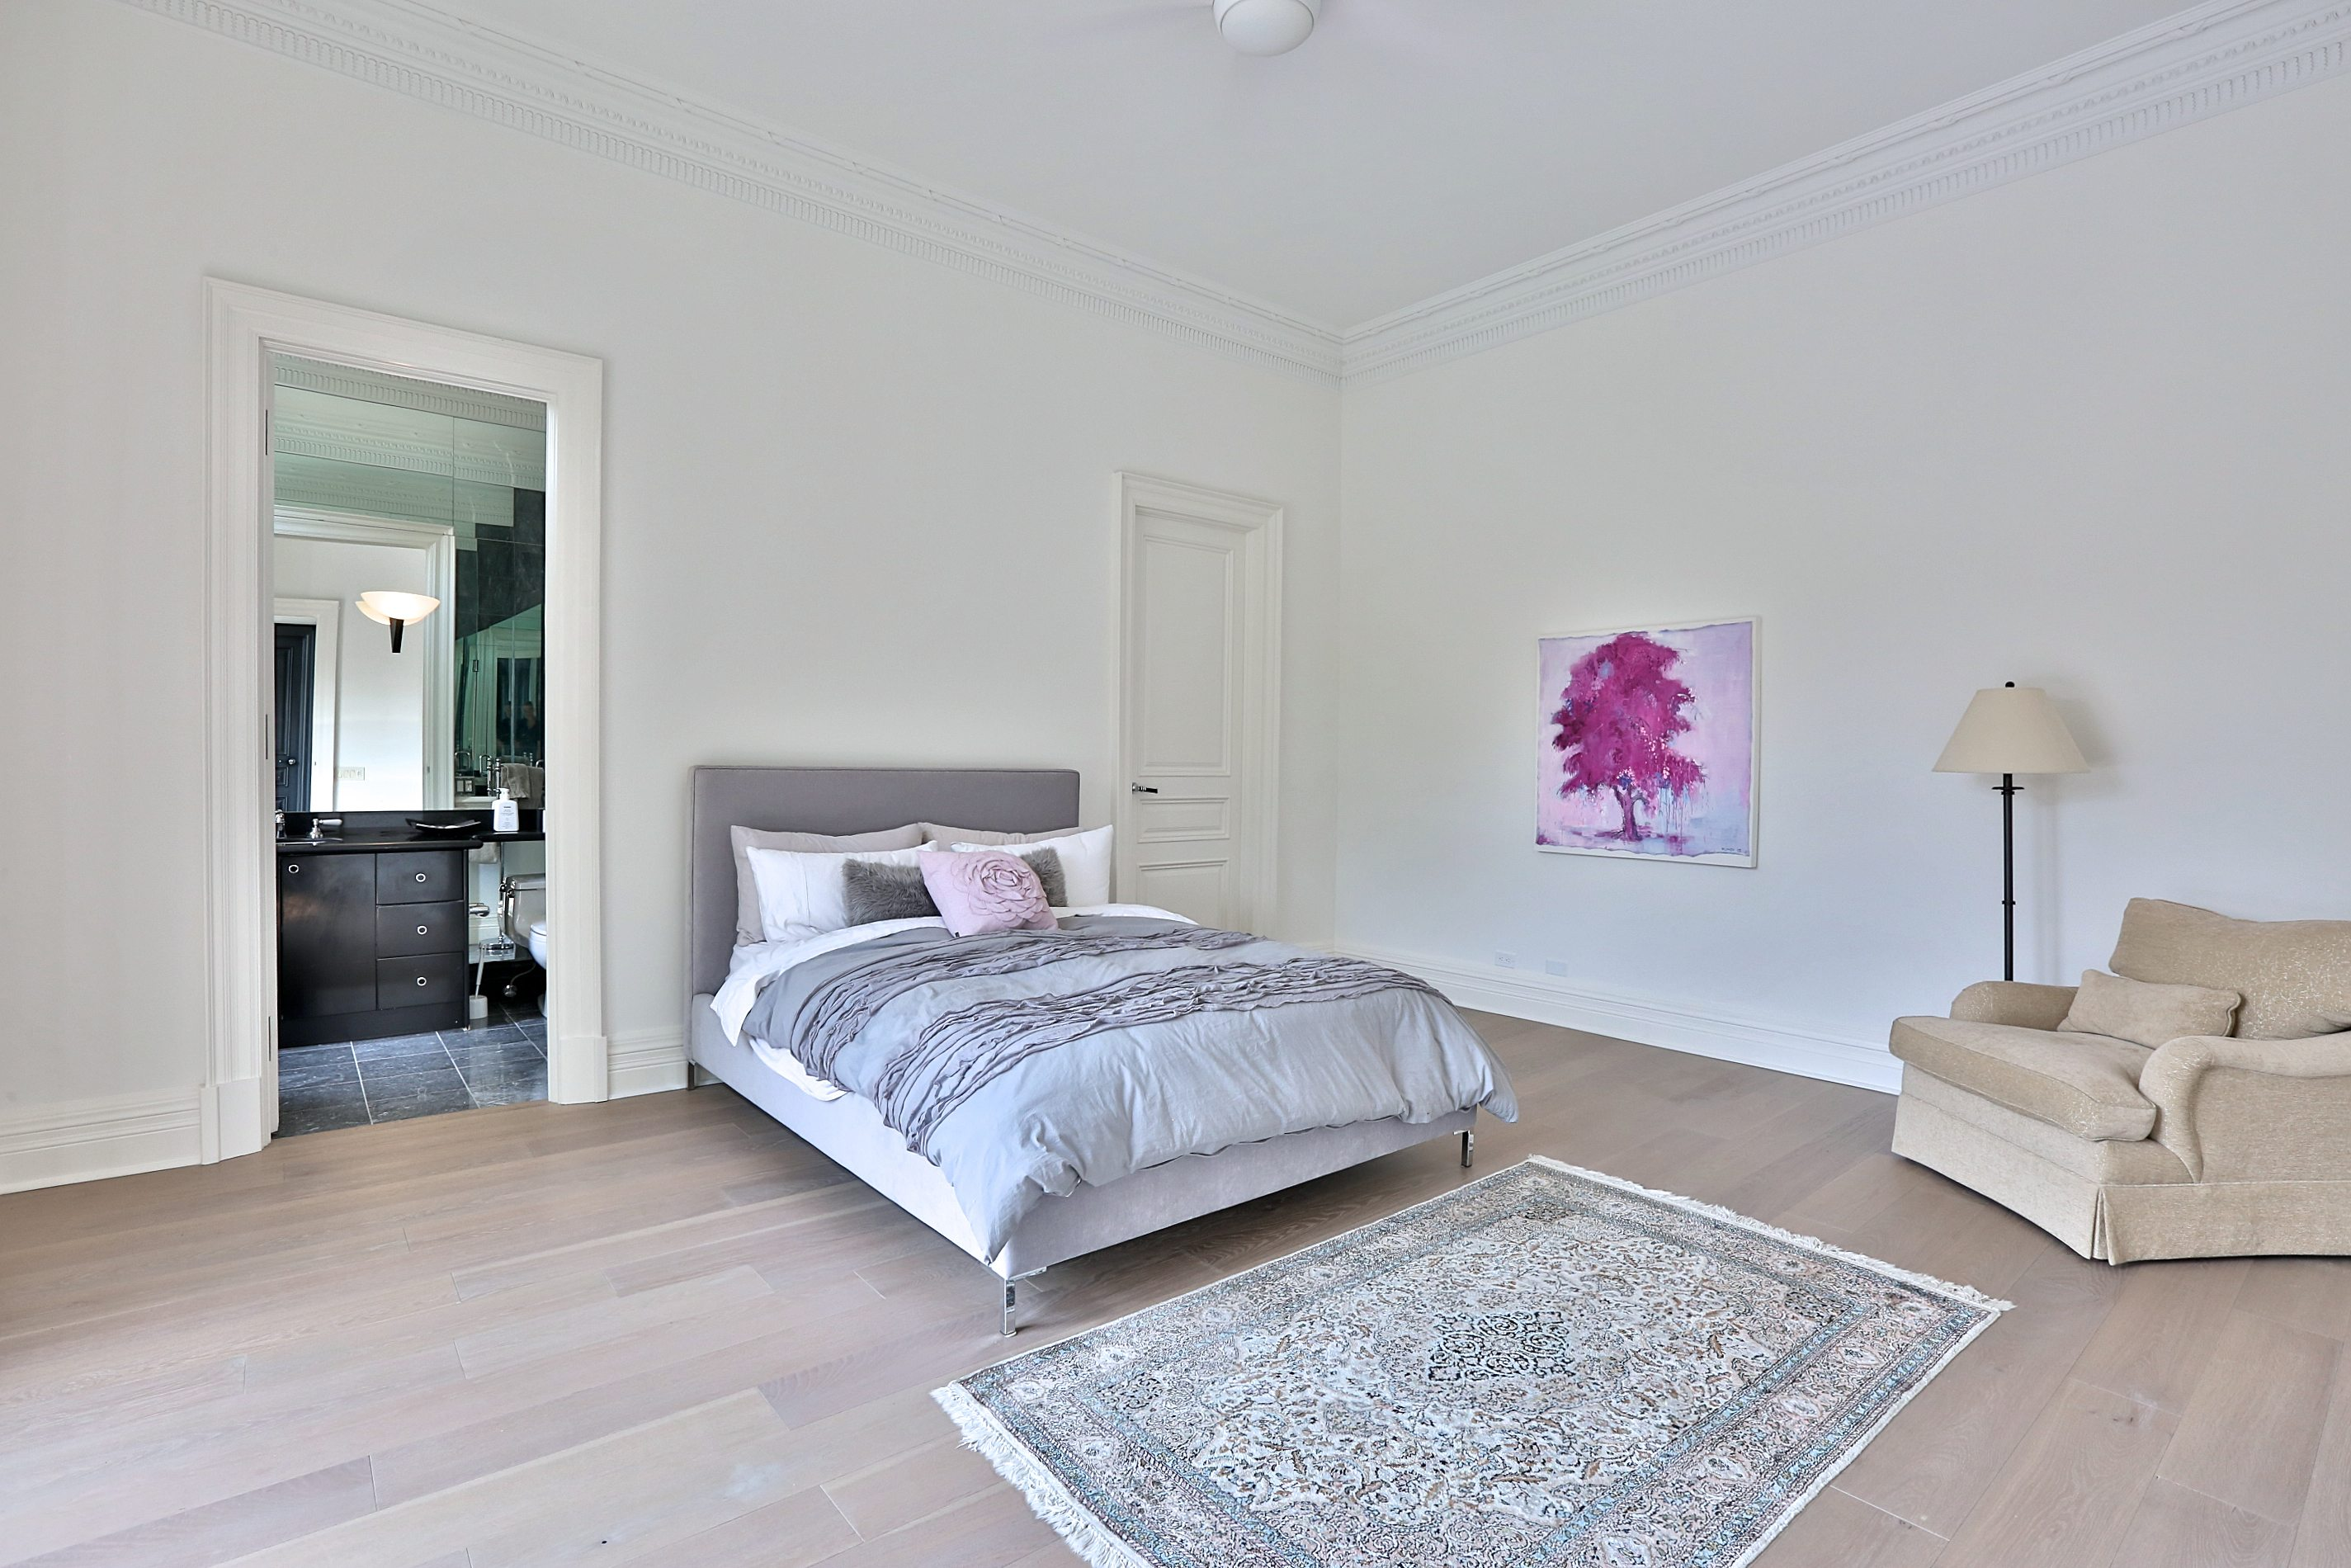 toronto-house-for-sale-7-sherwood-lane-12